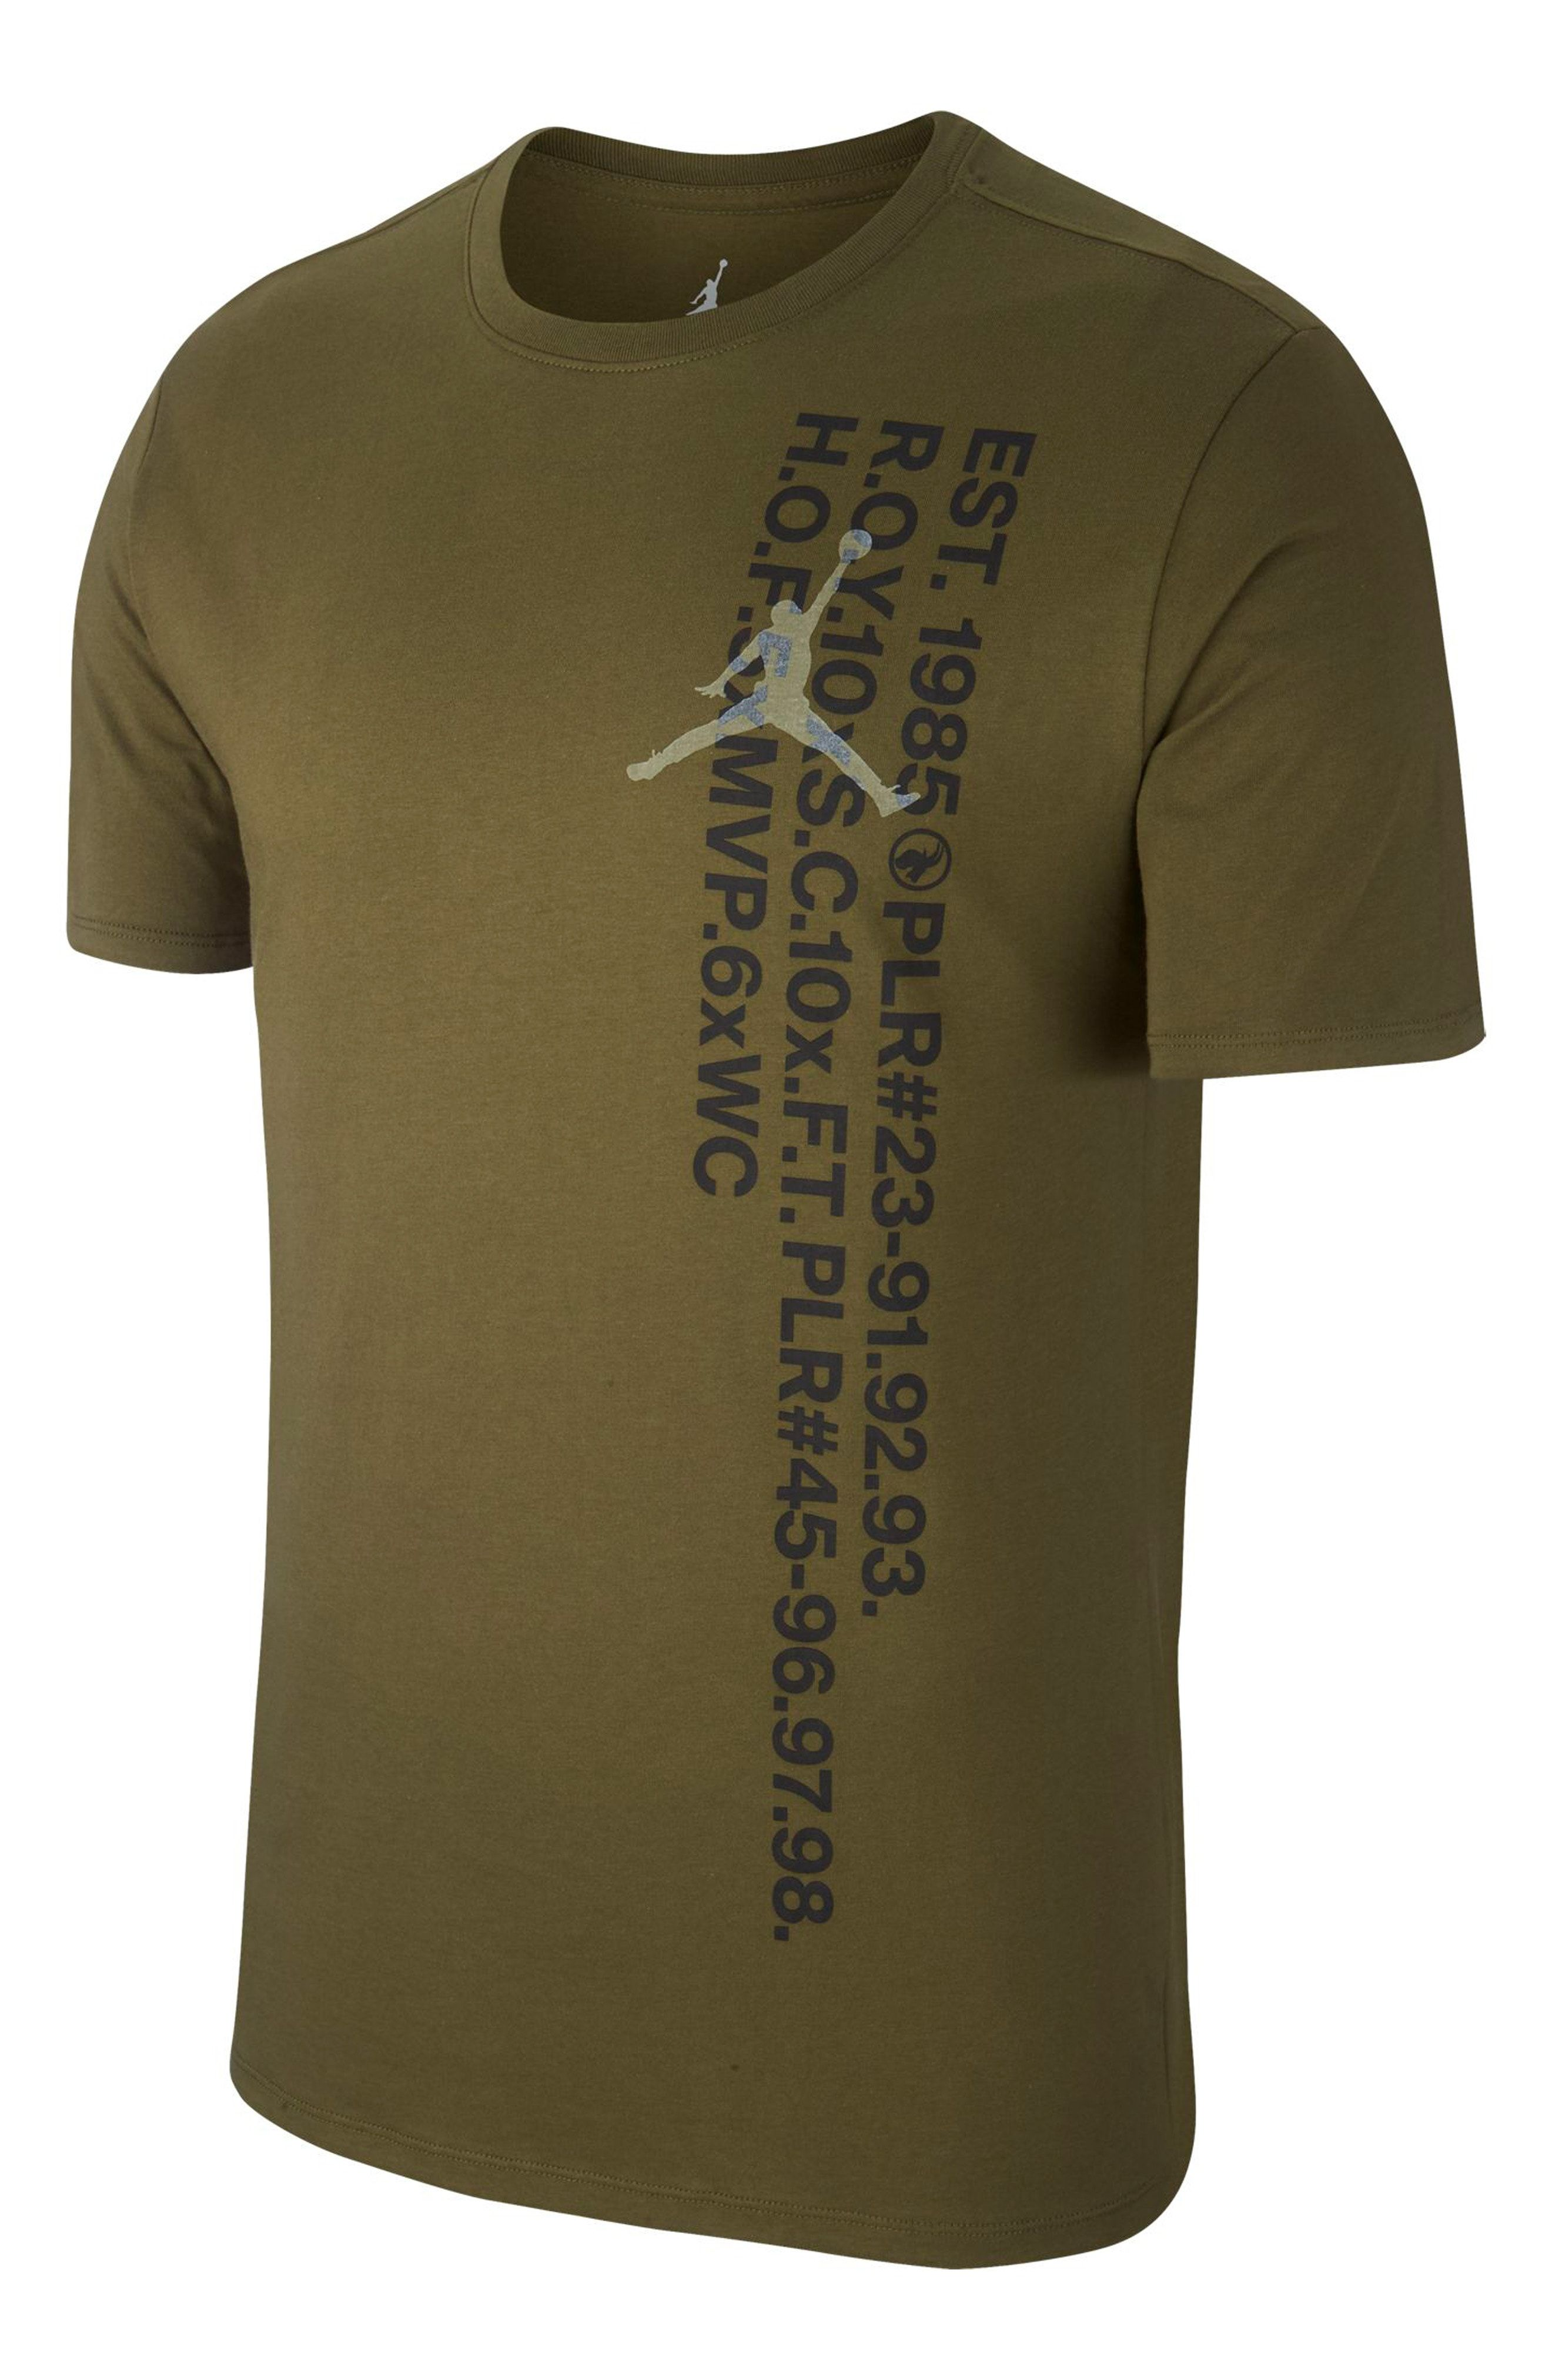 003c878d406dae JORDAN SPORTSWEAR GREATEST GRAPHIC T-SHIRT.  jordan  cloth